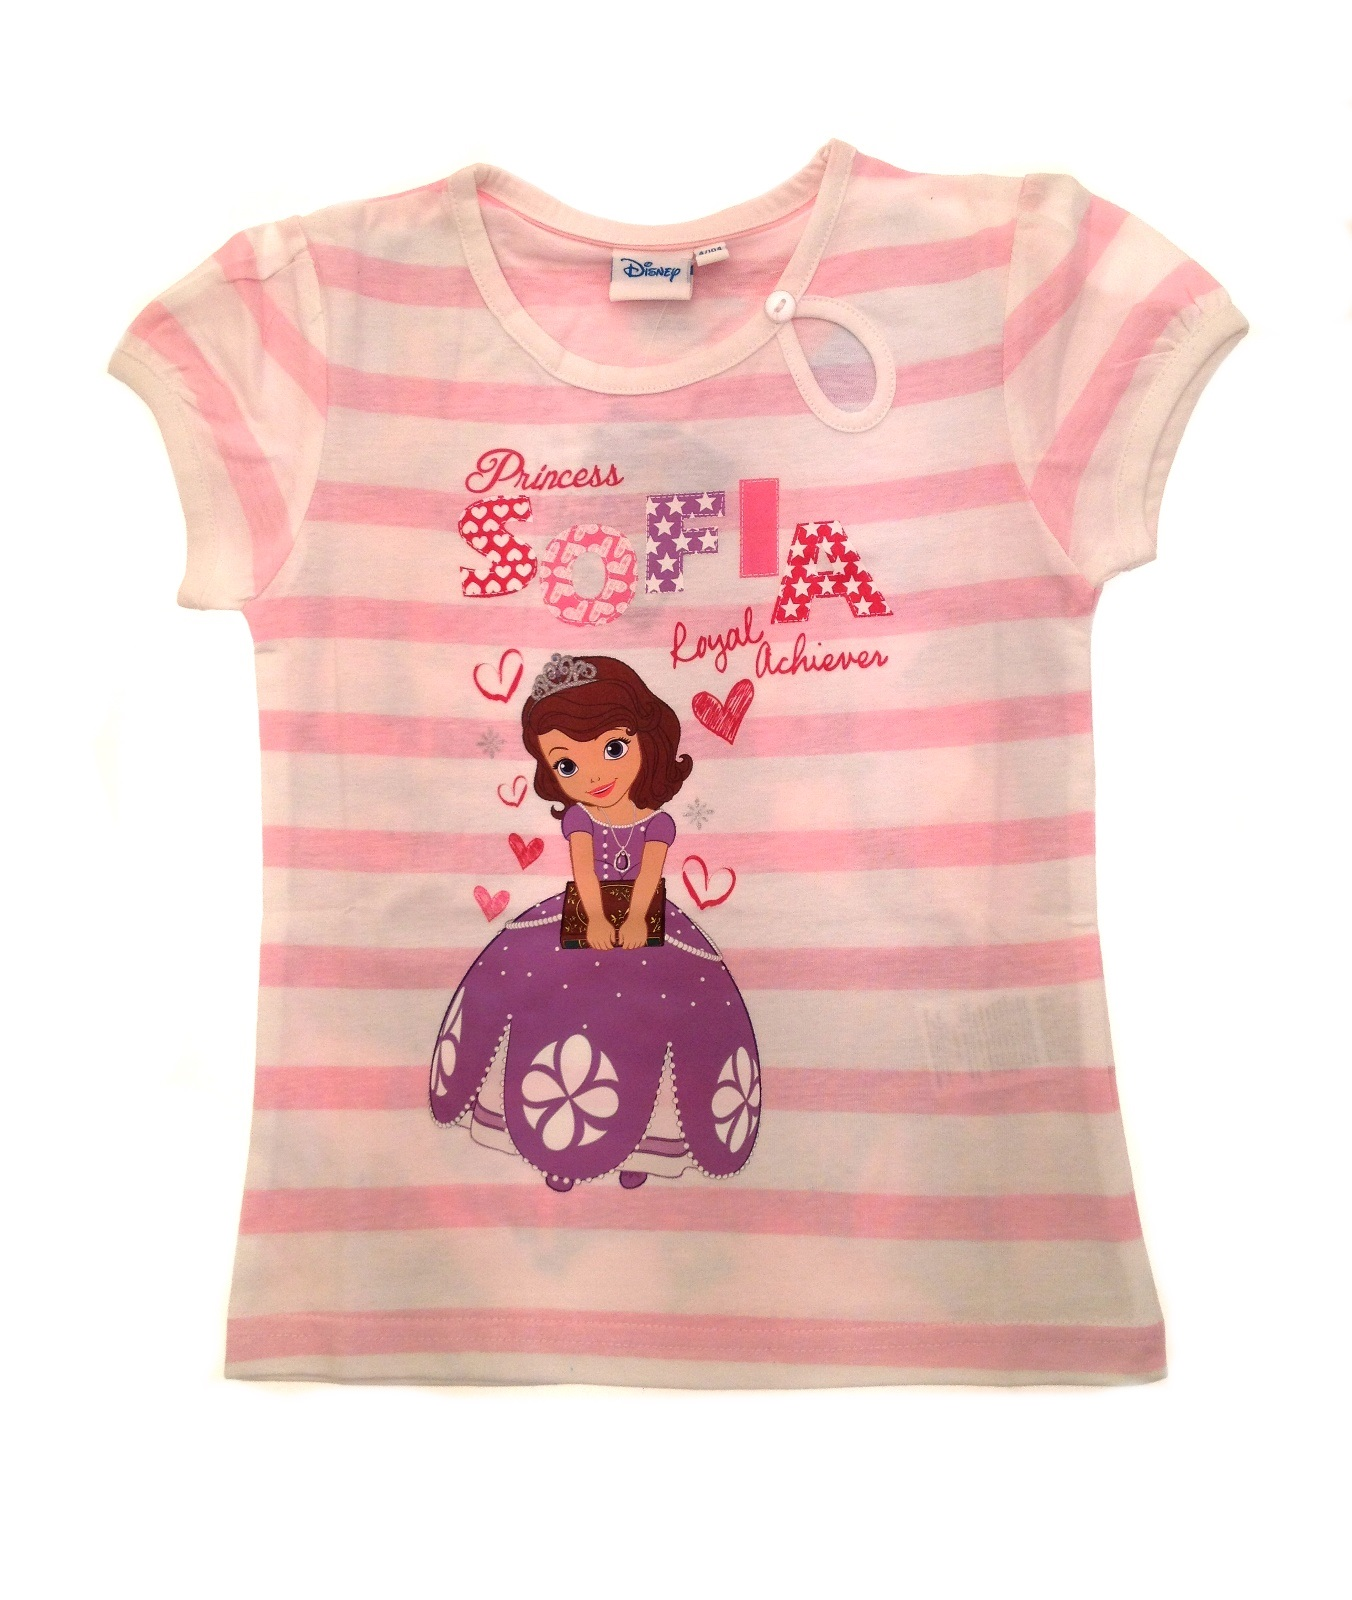 Disney Princess Sofia T Shirt Short Sleeved Top Girls